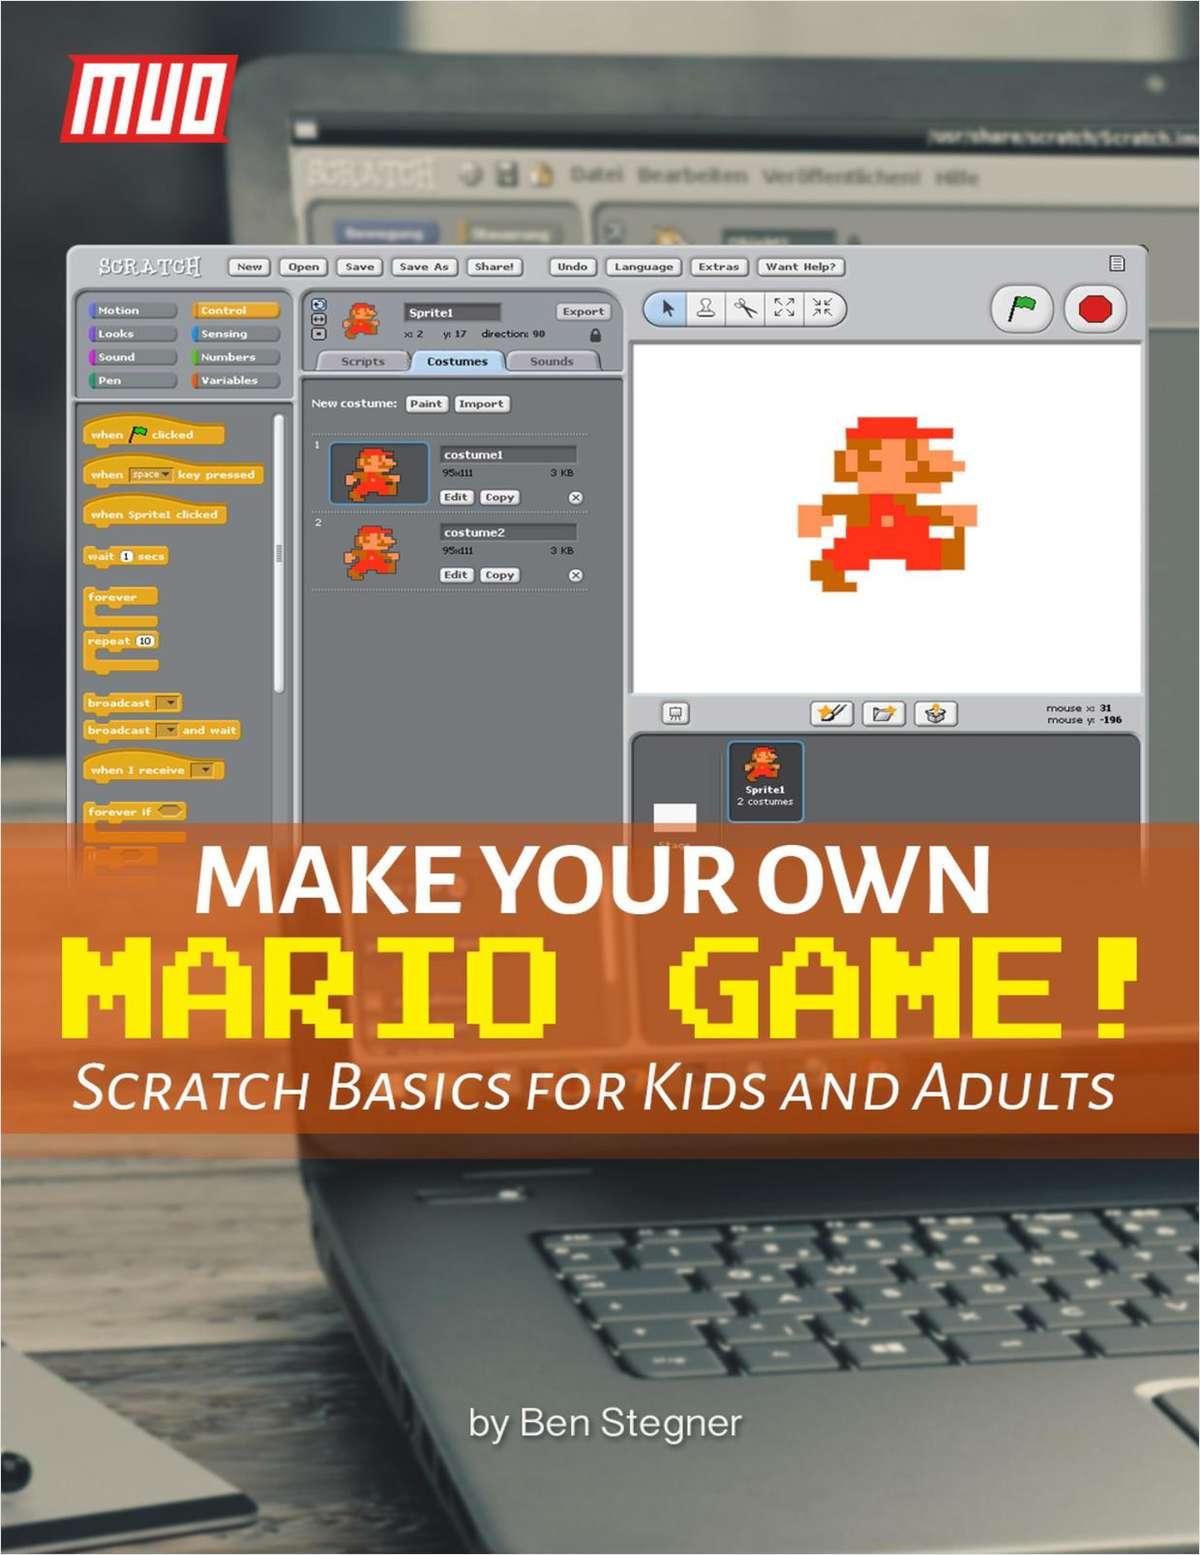 Make Your Own Mario Game!